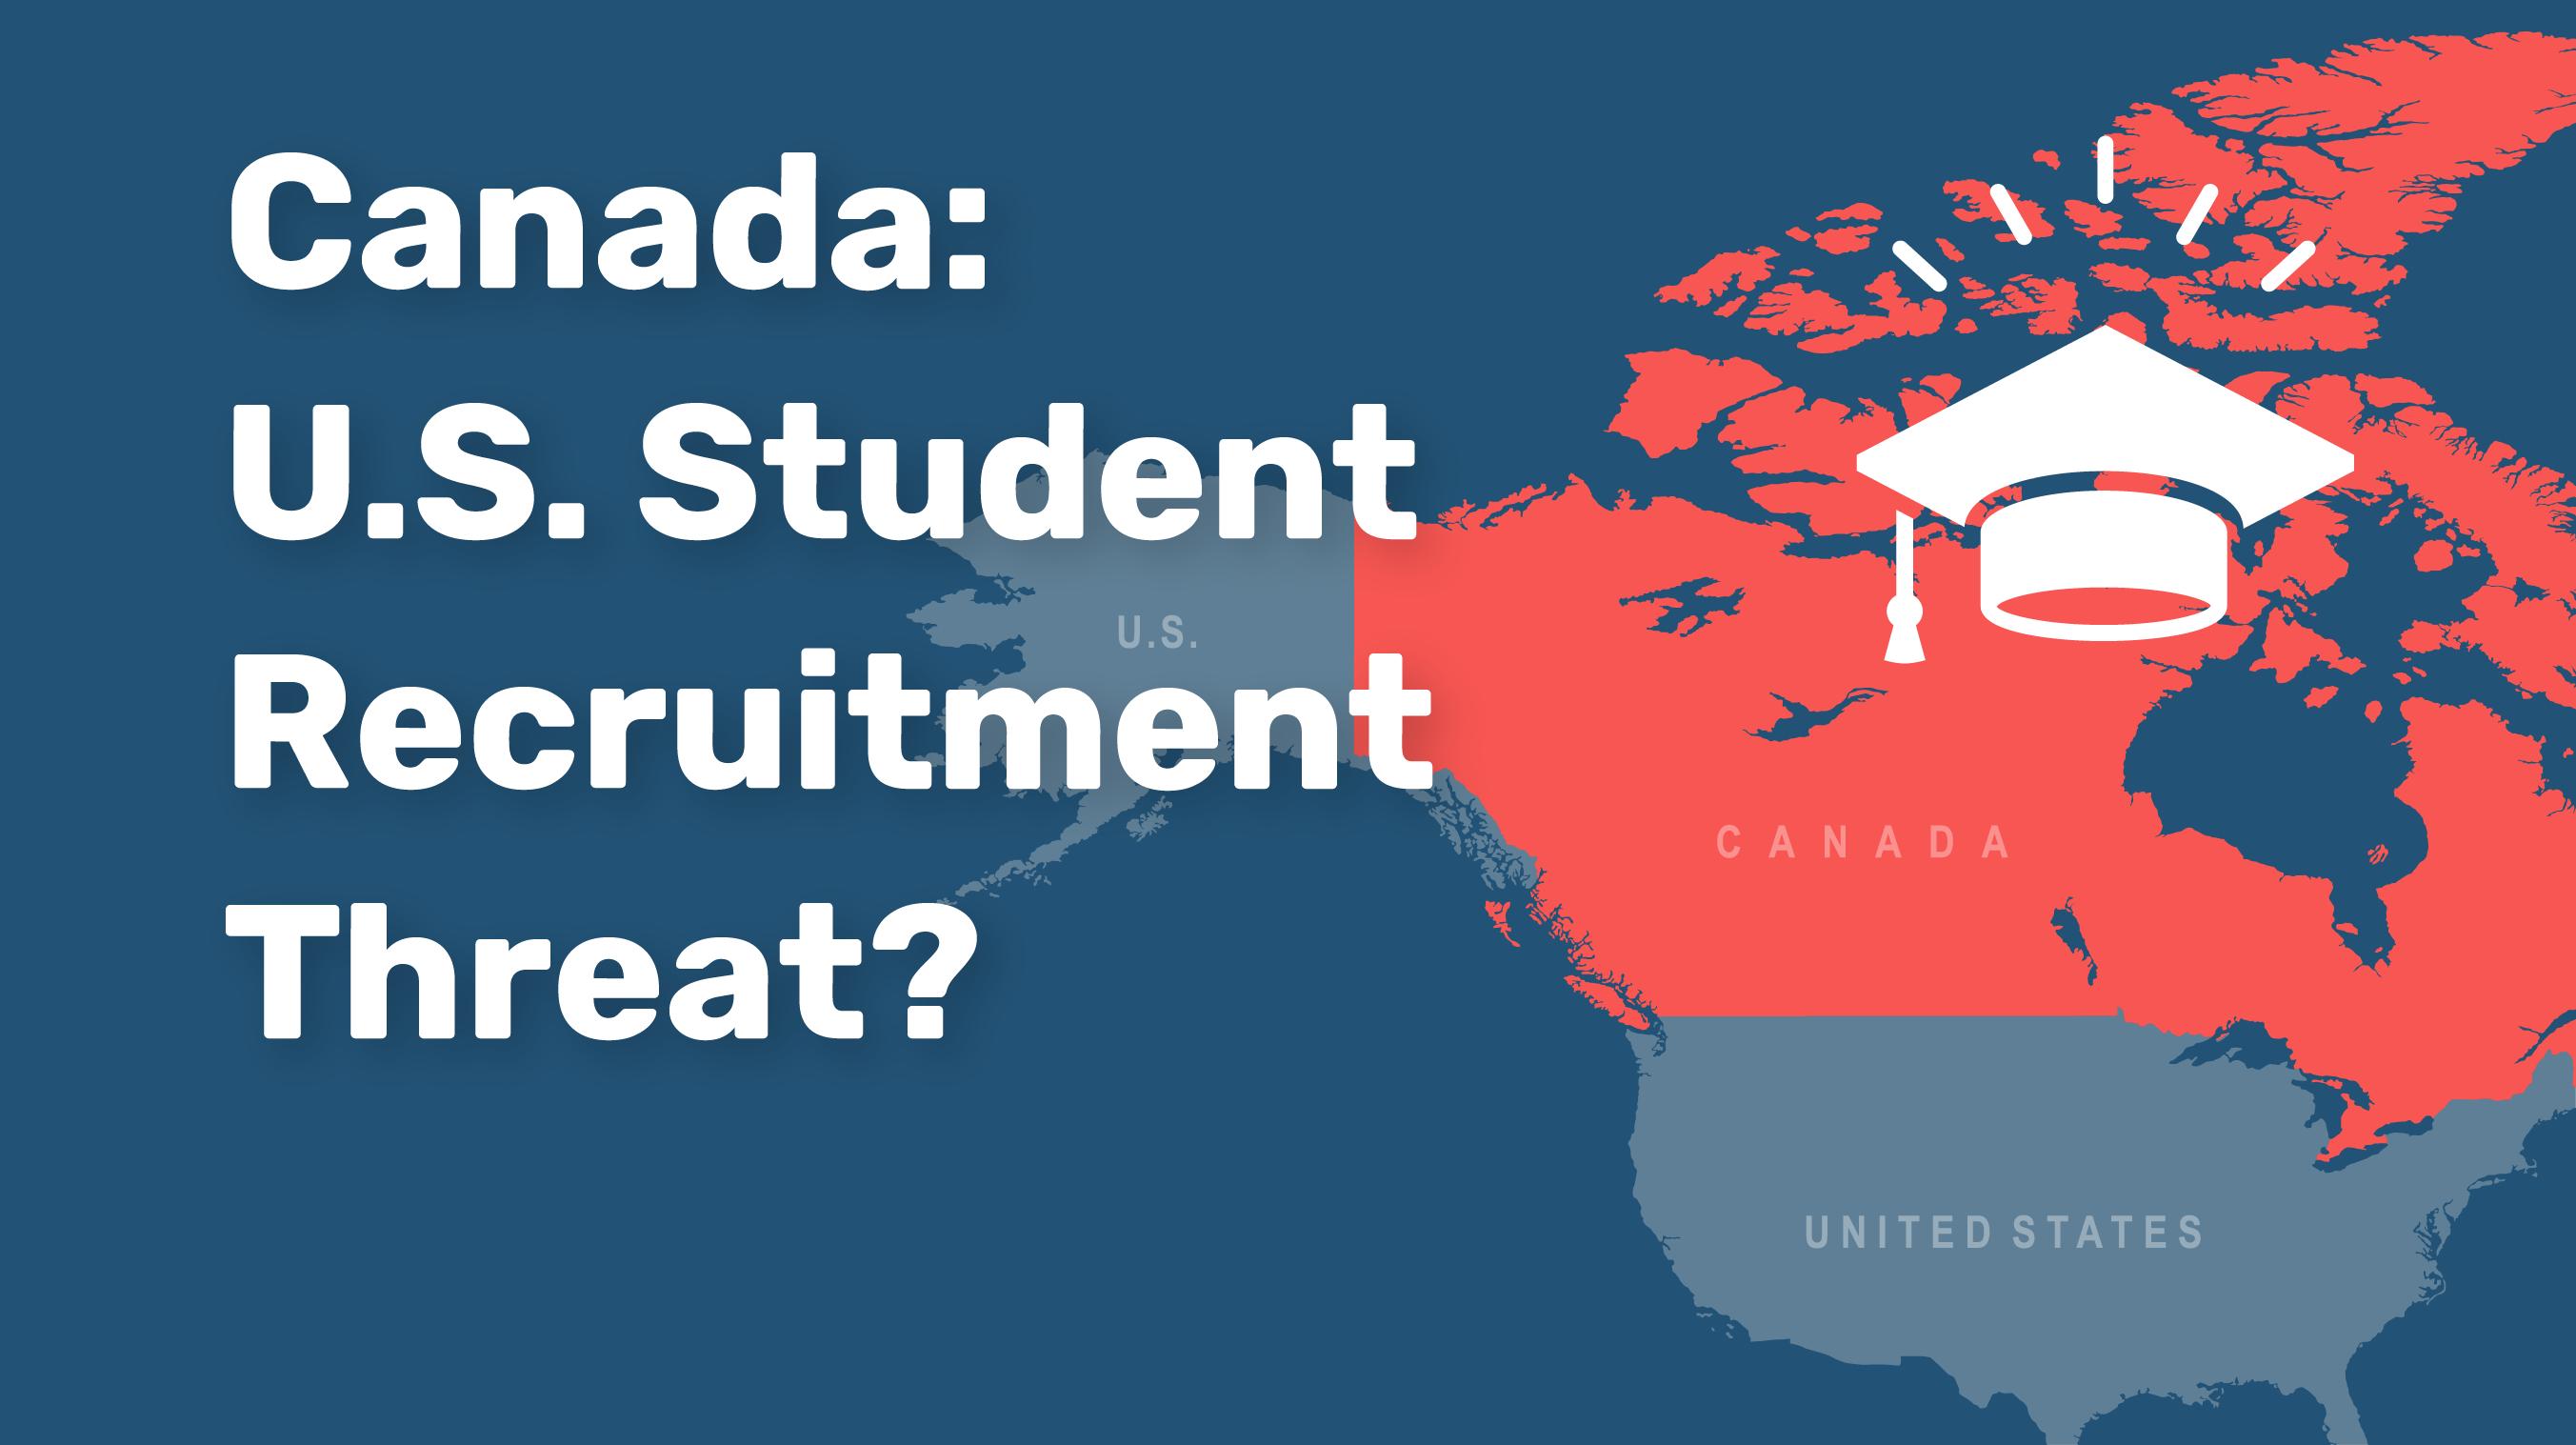 Canada: U.S. Student Recruitment Threat?